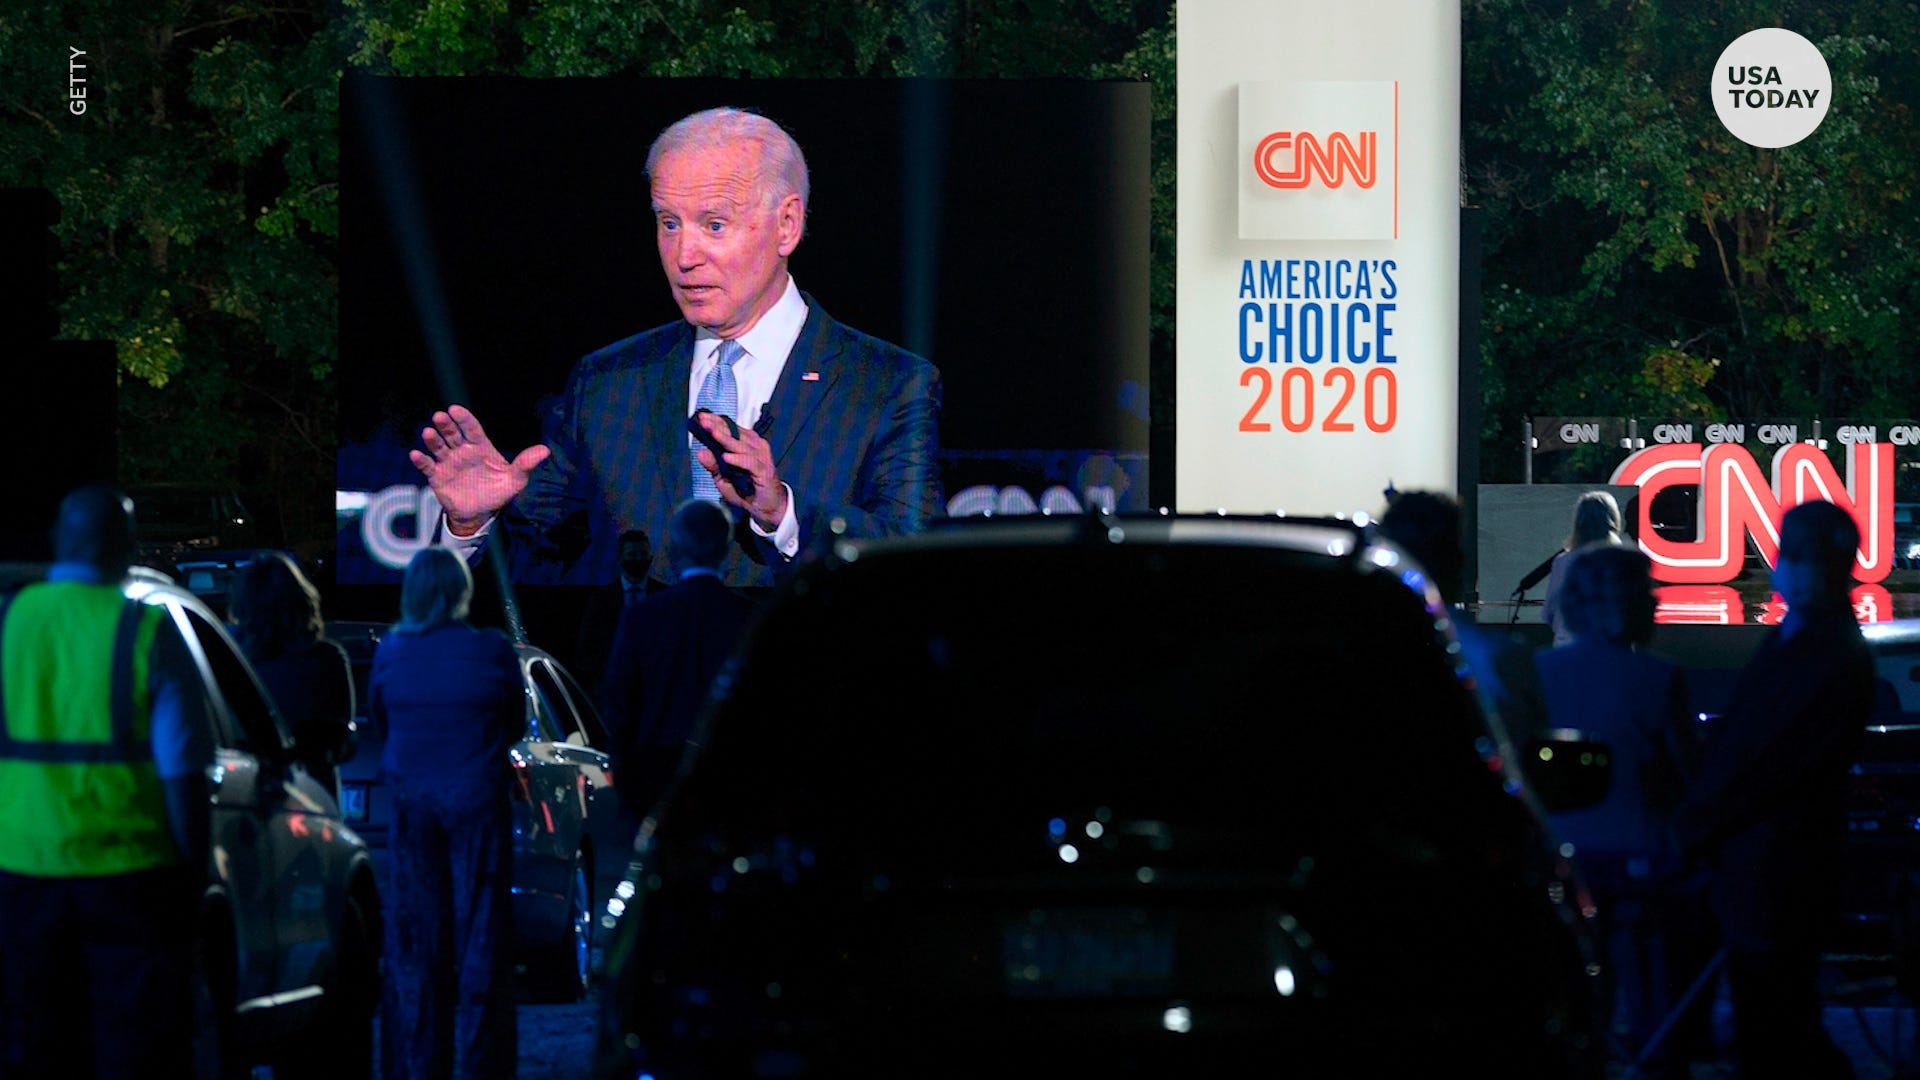 Biden says presidential election a battle between 'Scranton and Park Avenue'